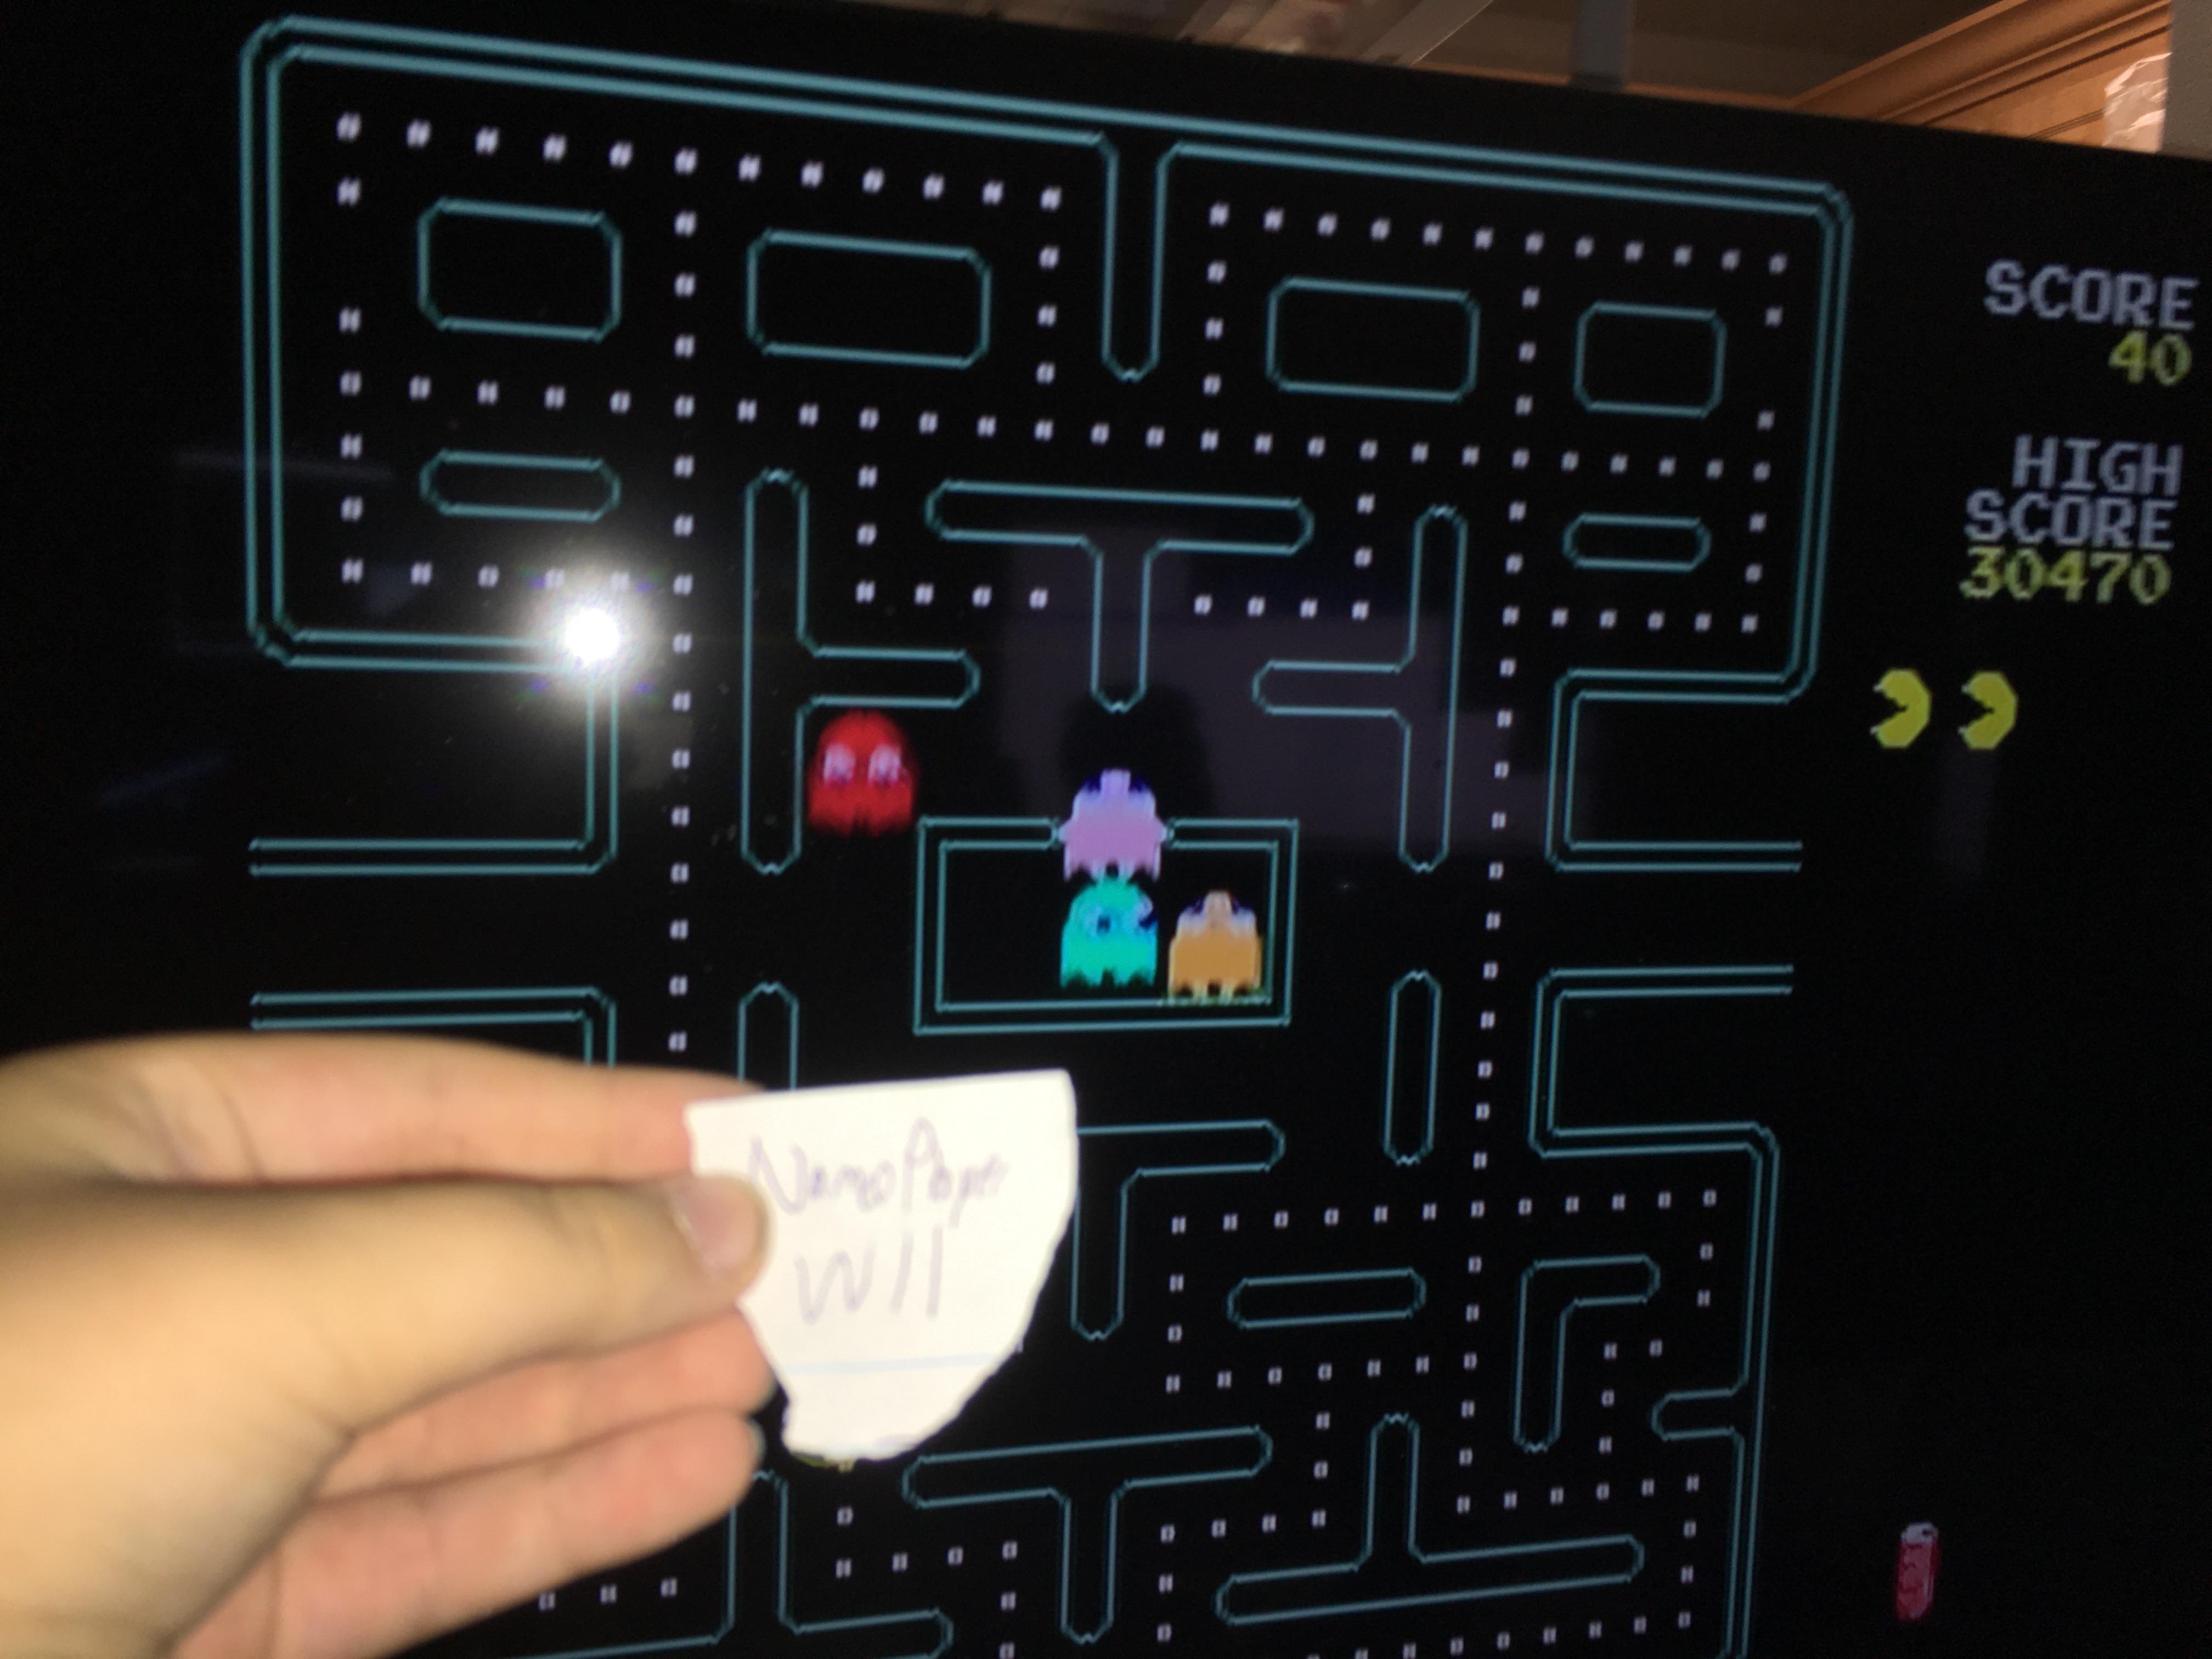 NamcoPlayer: Pac-Man Plus (Jakks Pacific Retro Arcade Pac-Man) 30,470 points on 2020-12-04 16:32:07